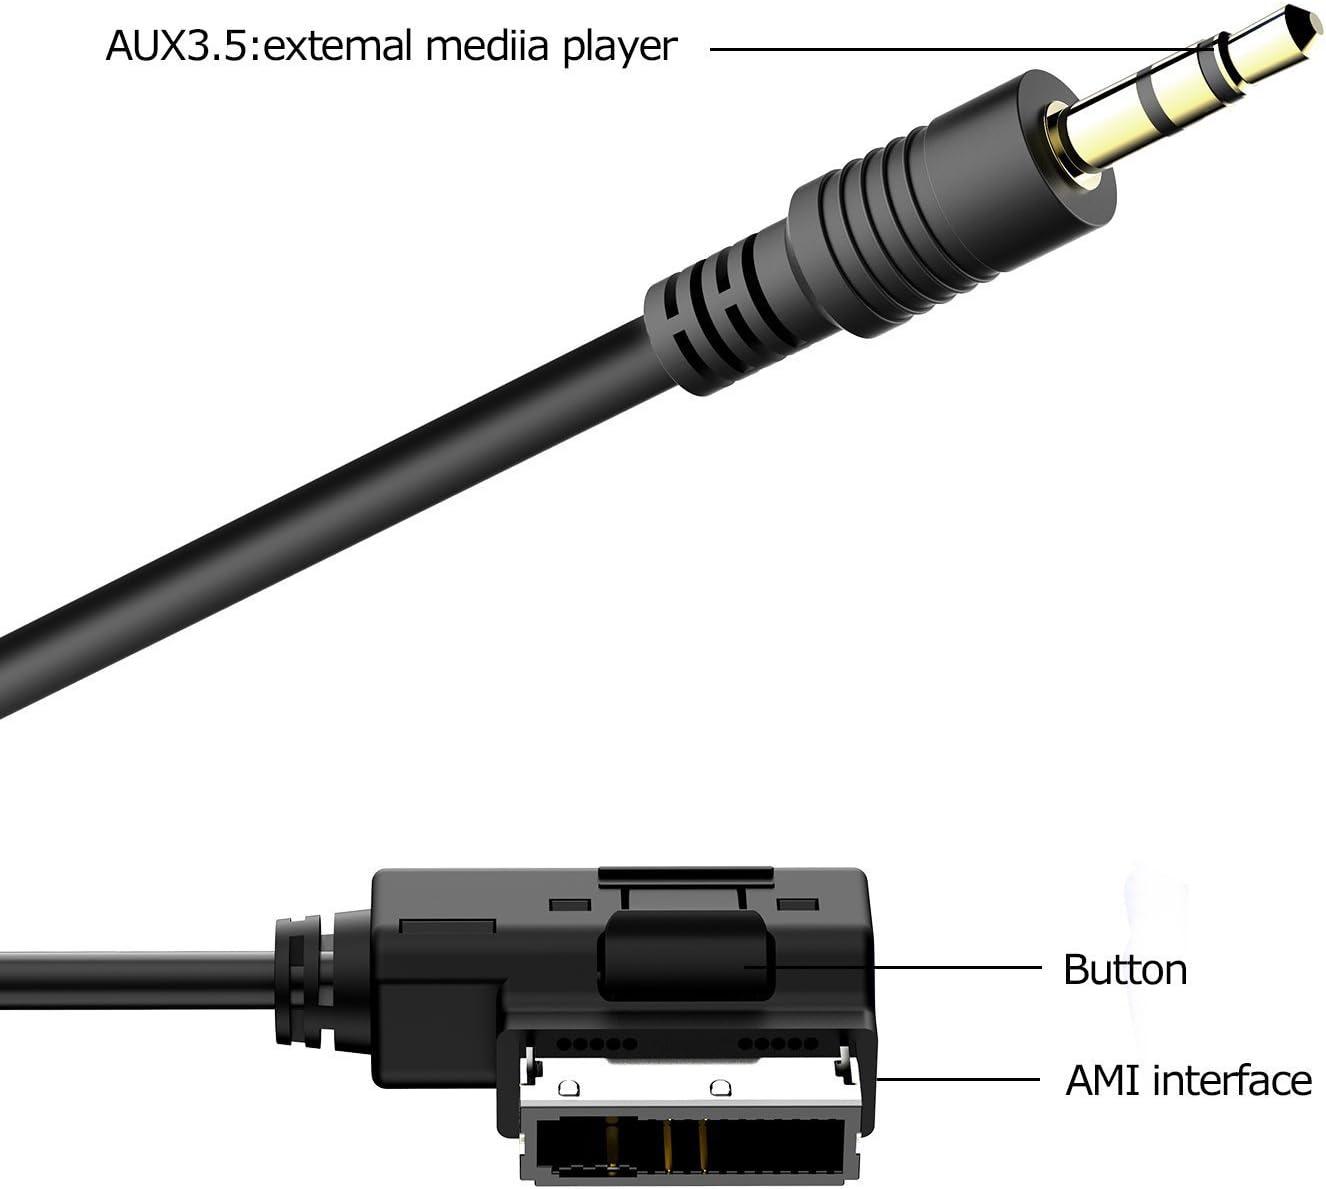 AMI 3.5 USB F SINLOON Car Media AMI MDI to Stereo 3.5mm Audio USB Female AUX Adapter Cable to Audi A3 A4 A5 A6 S5 A6 A8 Q7 S4 S8 TT//VW Jetta GTI GLI Jetta Passat Cc Tiguan Touareg EOS